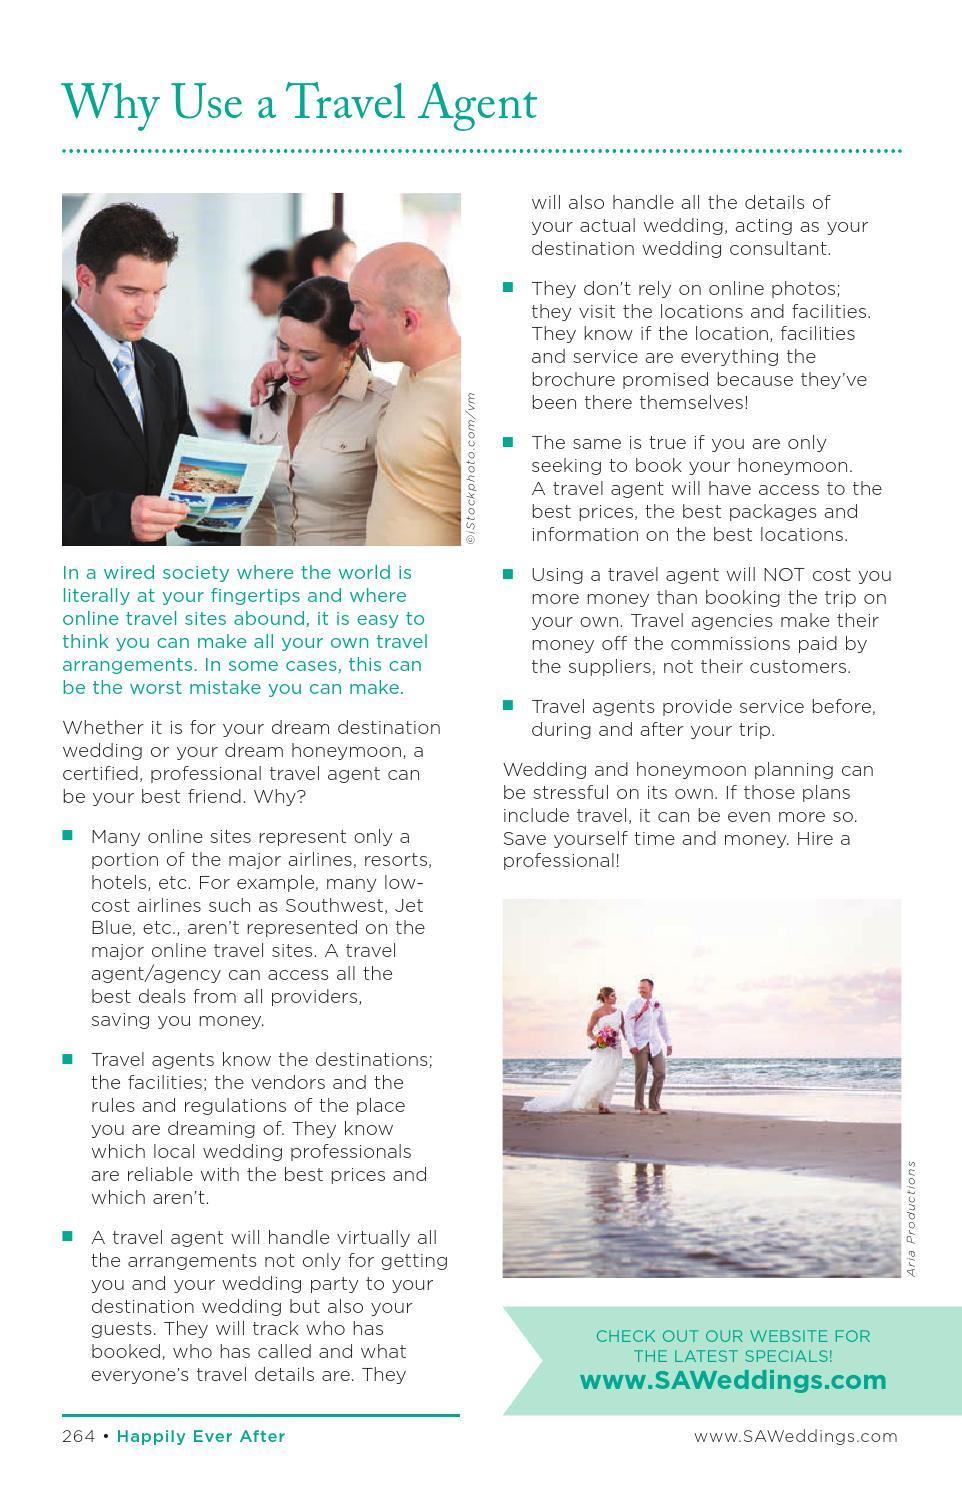 San Antonio's Wedding Guide #55